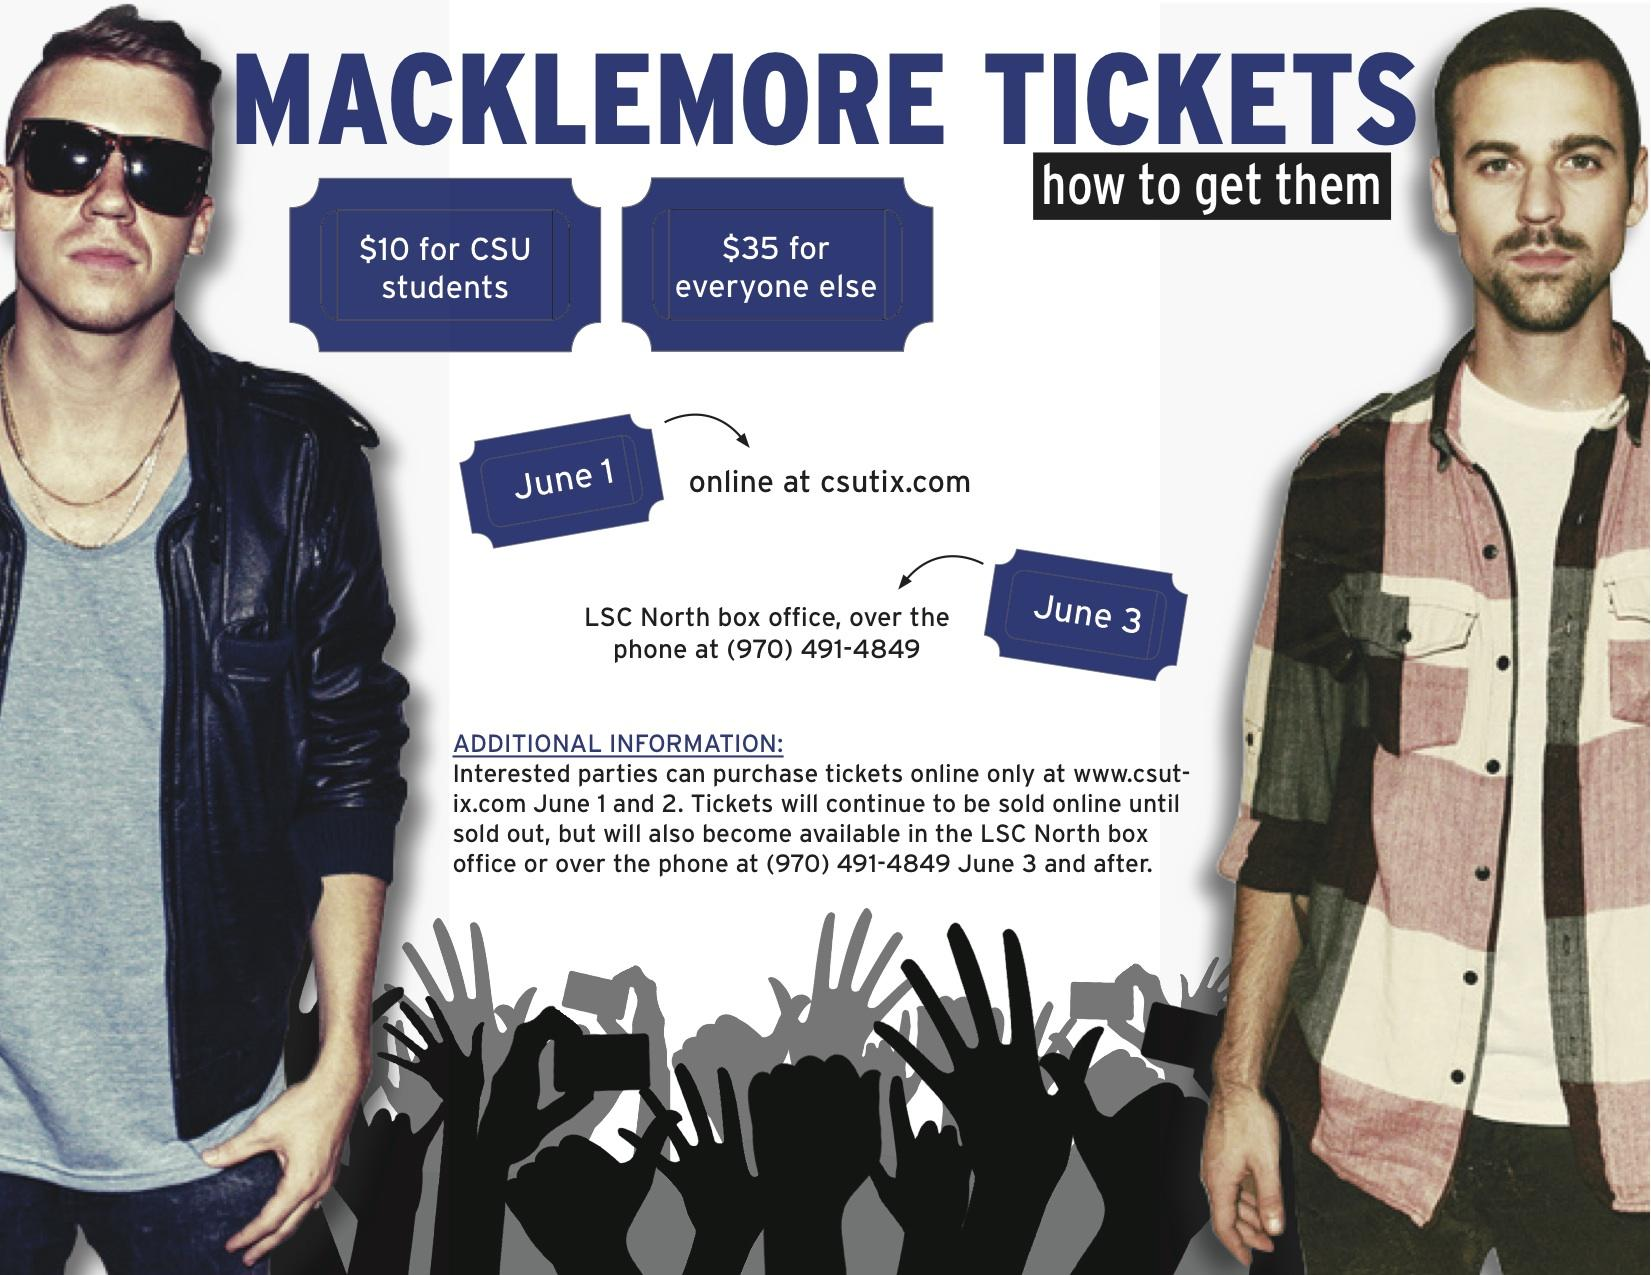 Correction, Macklemore